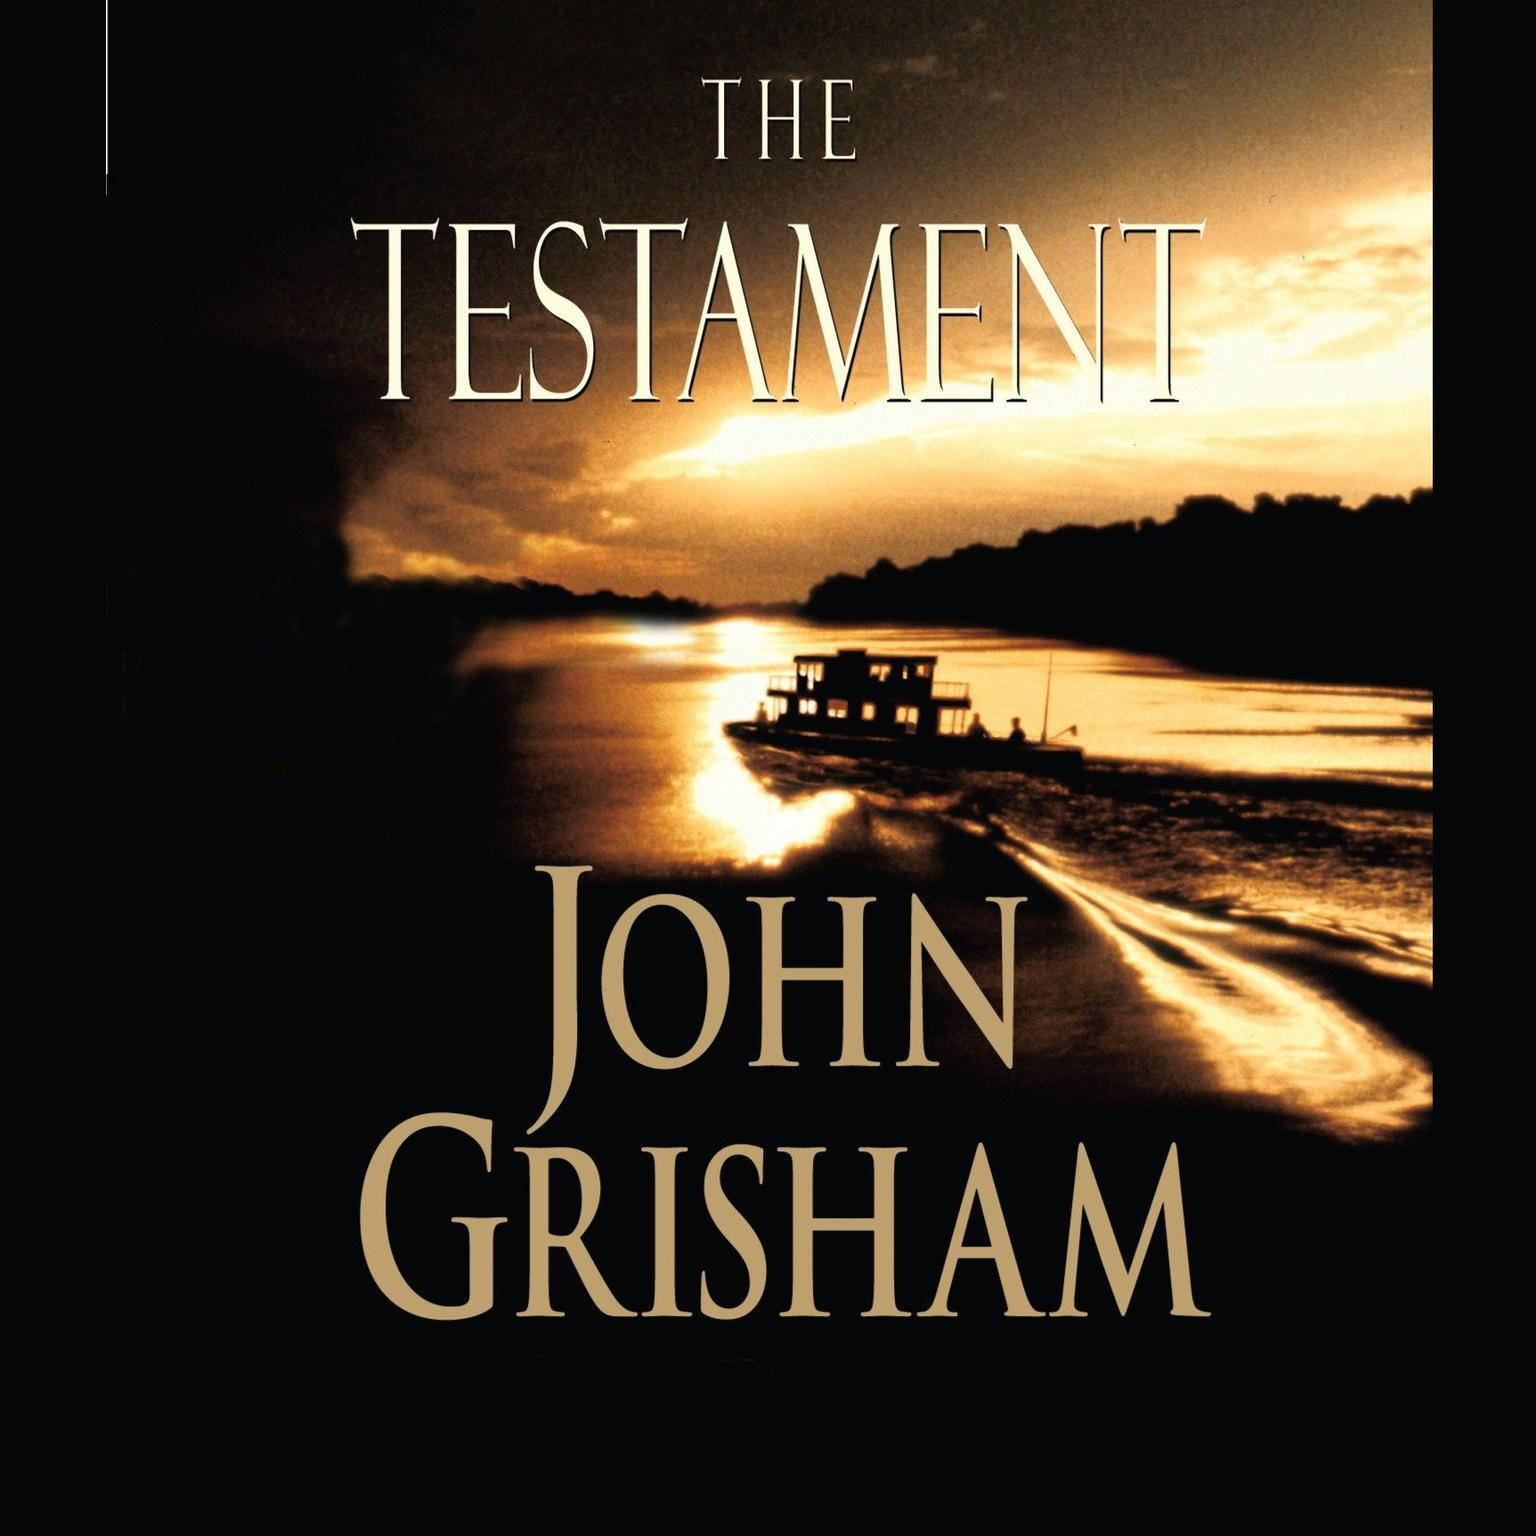 The Testament: A Novel Audiobook, by John Grisham